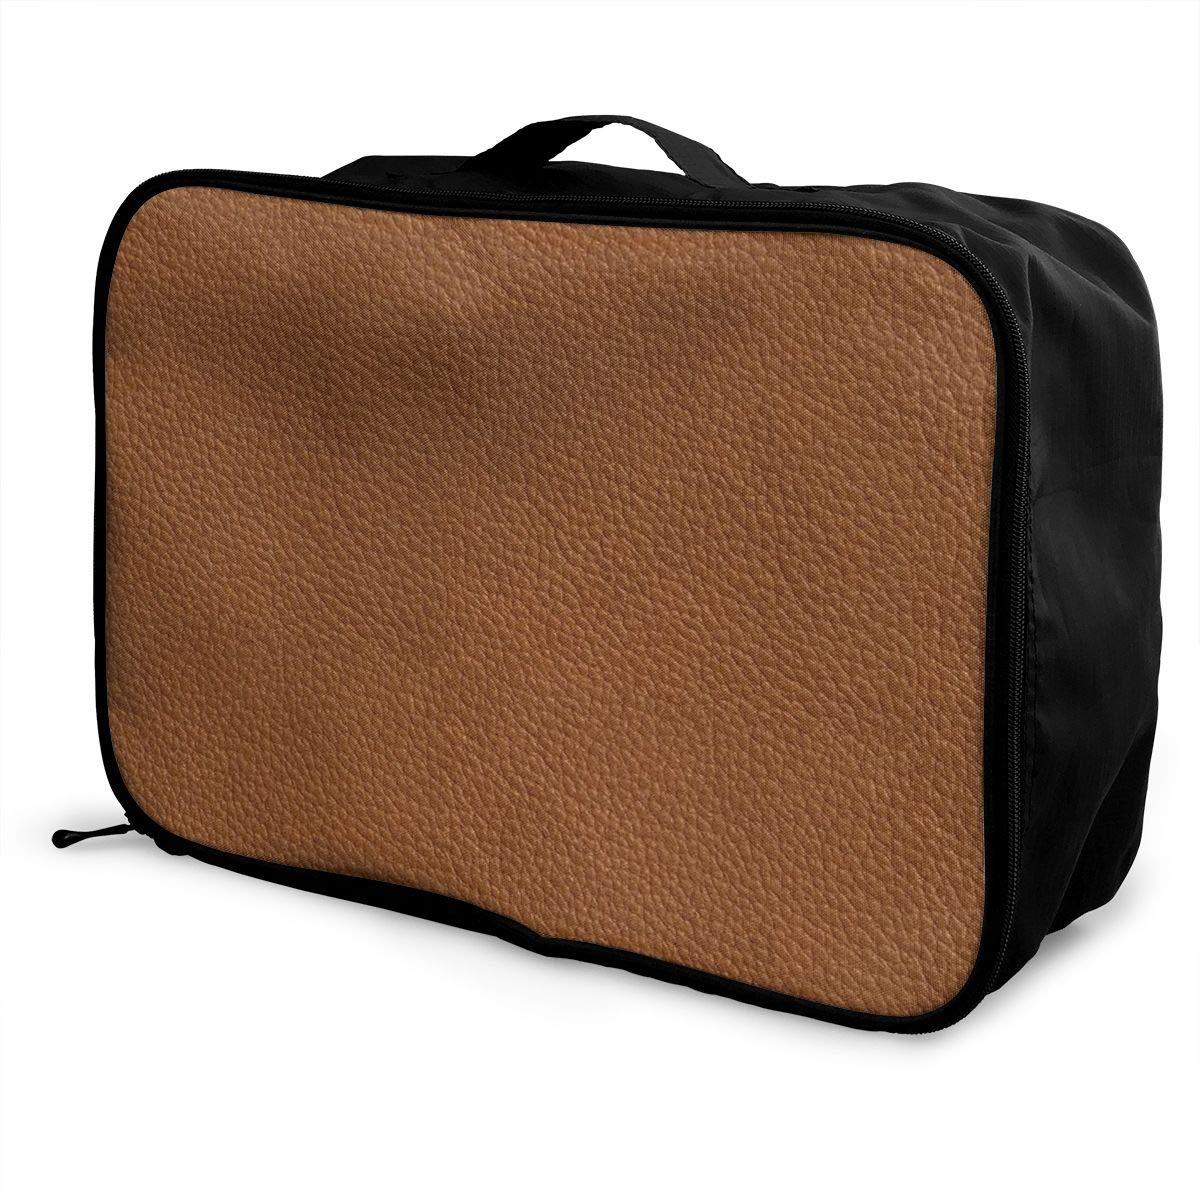 Travel Luggage Duffle Bag Lightweight Portable Handbag Brown Leather Pattern Print Large Capacity Waterproof Foldable Storage Tote